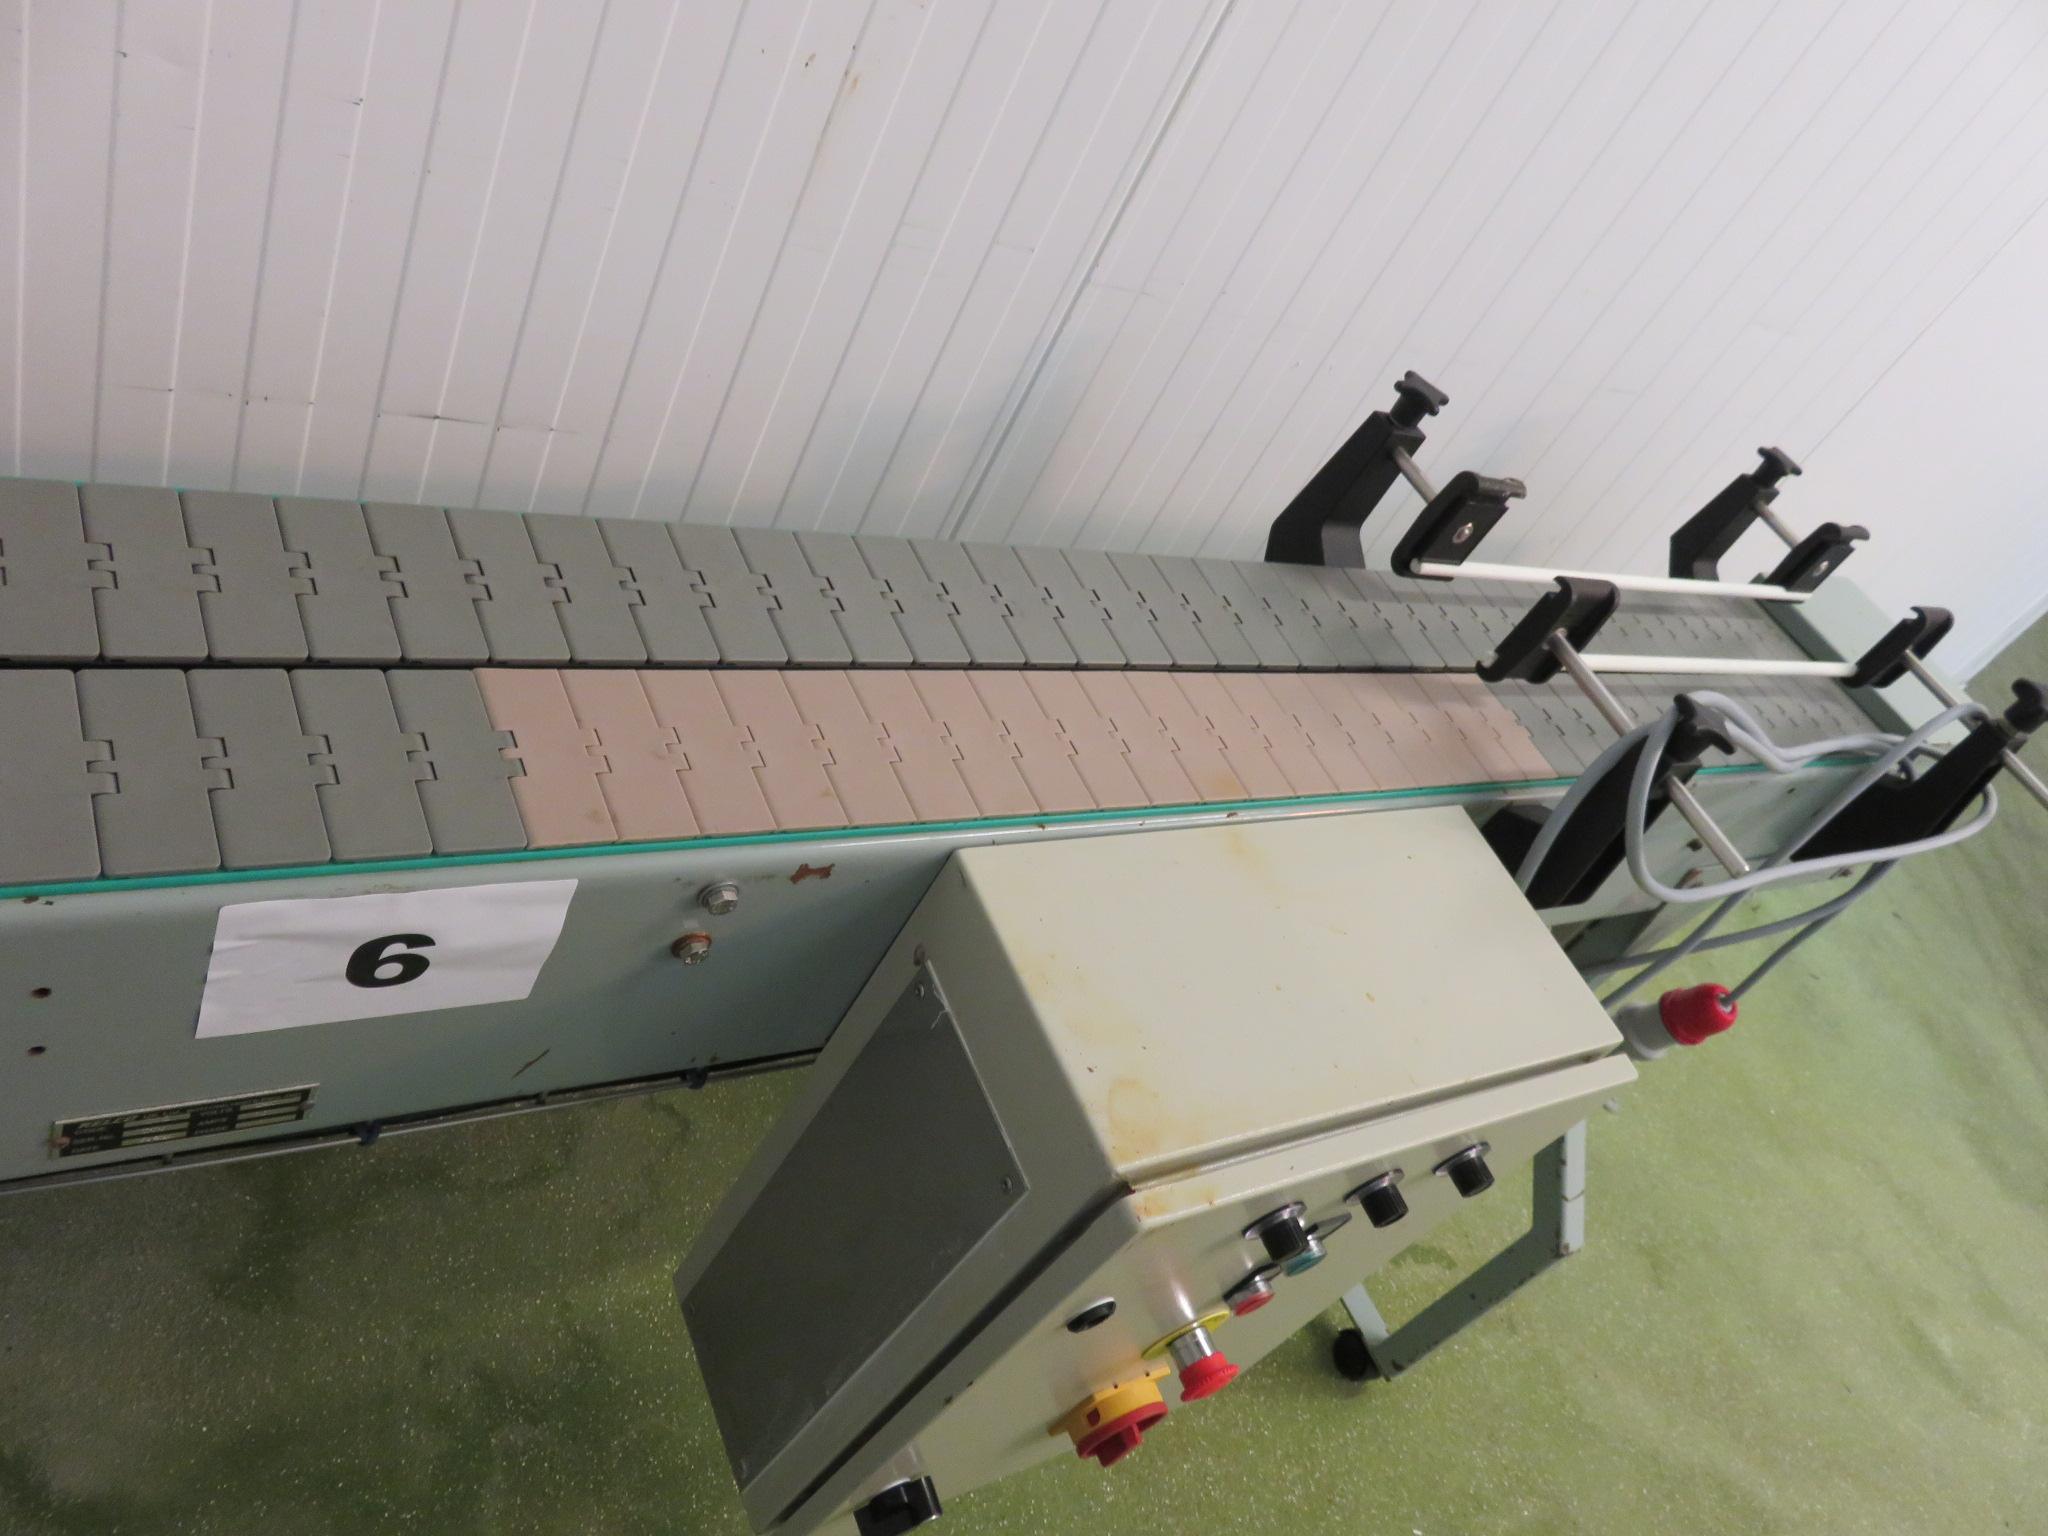 Lot 6 - 2-lane conveyor approx. 100 mm wide x 2 m long. LO £30.